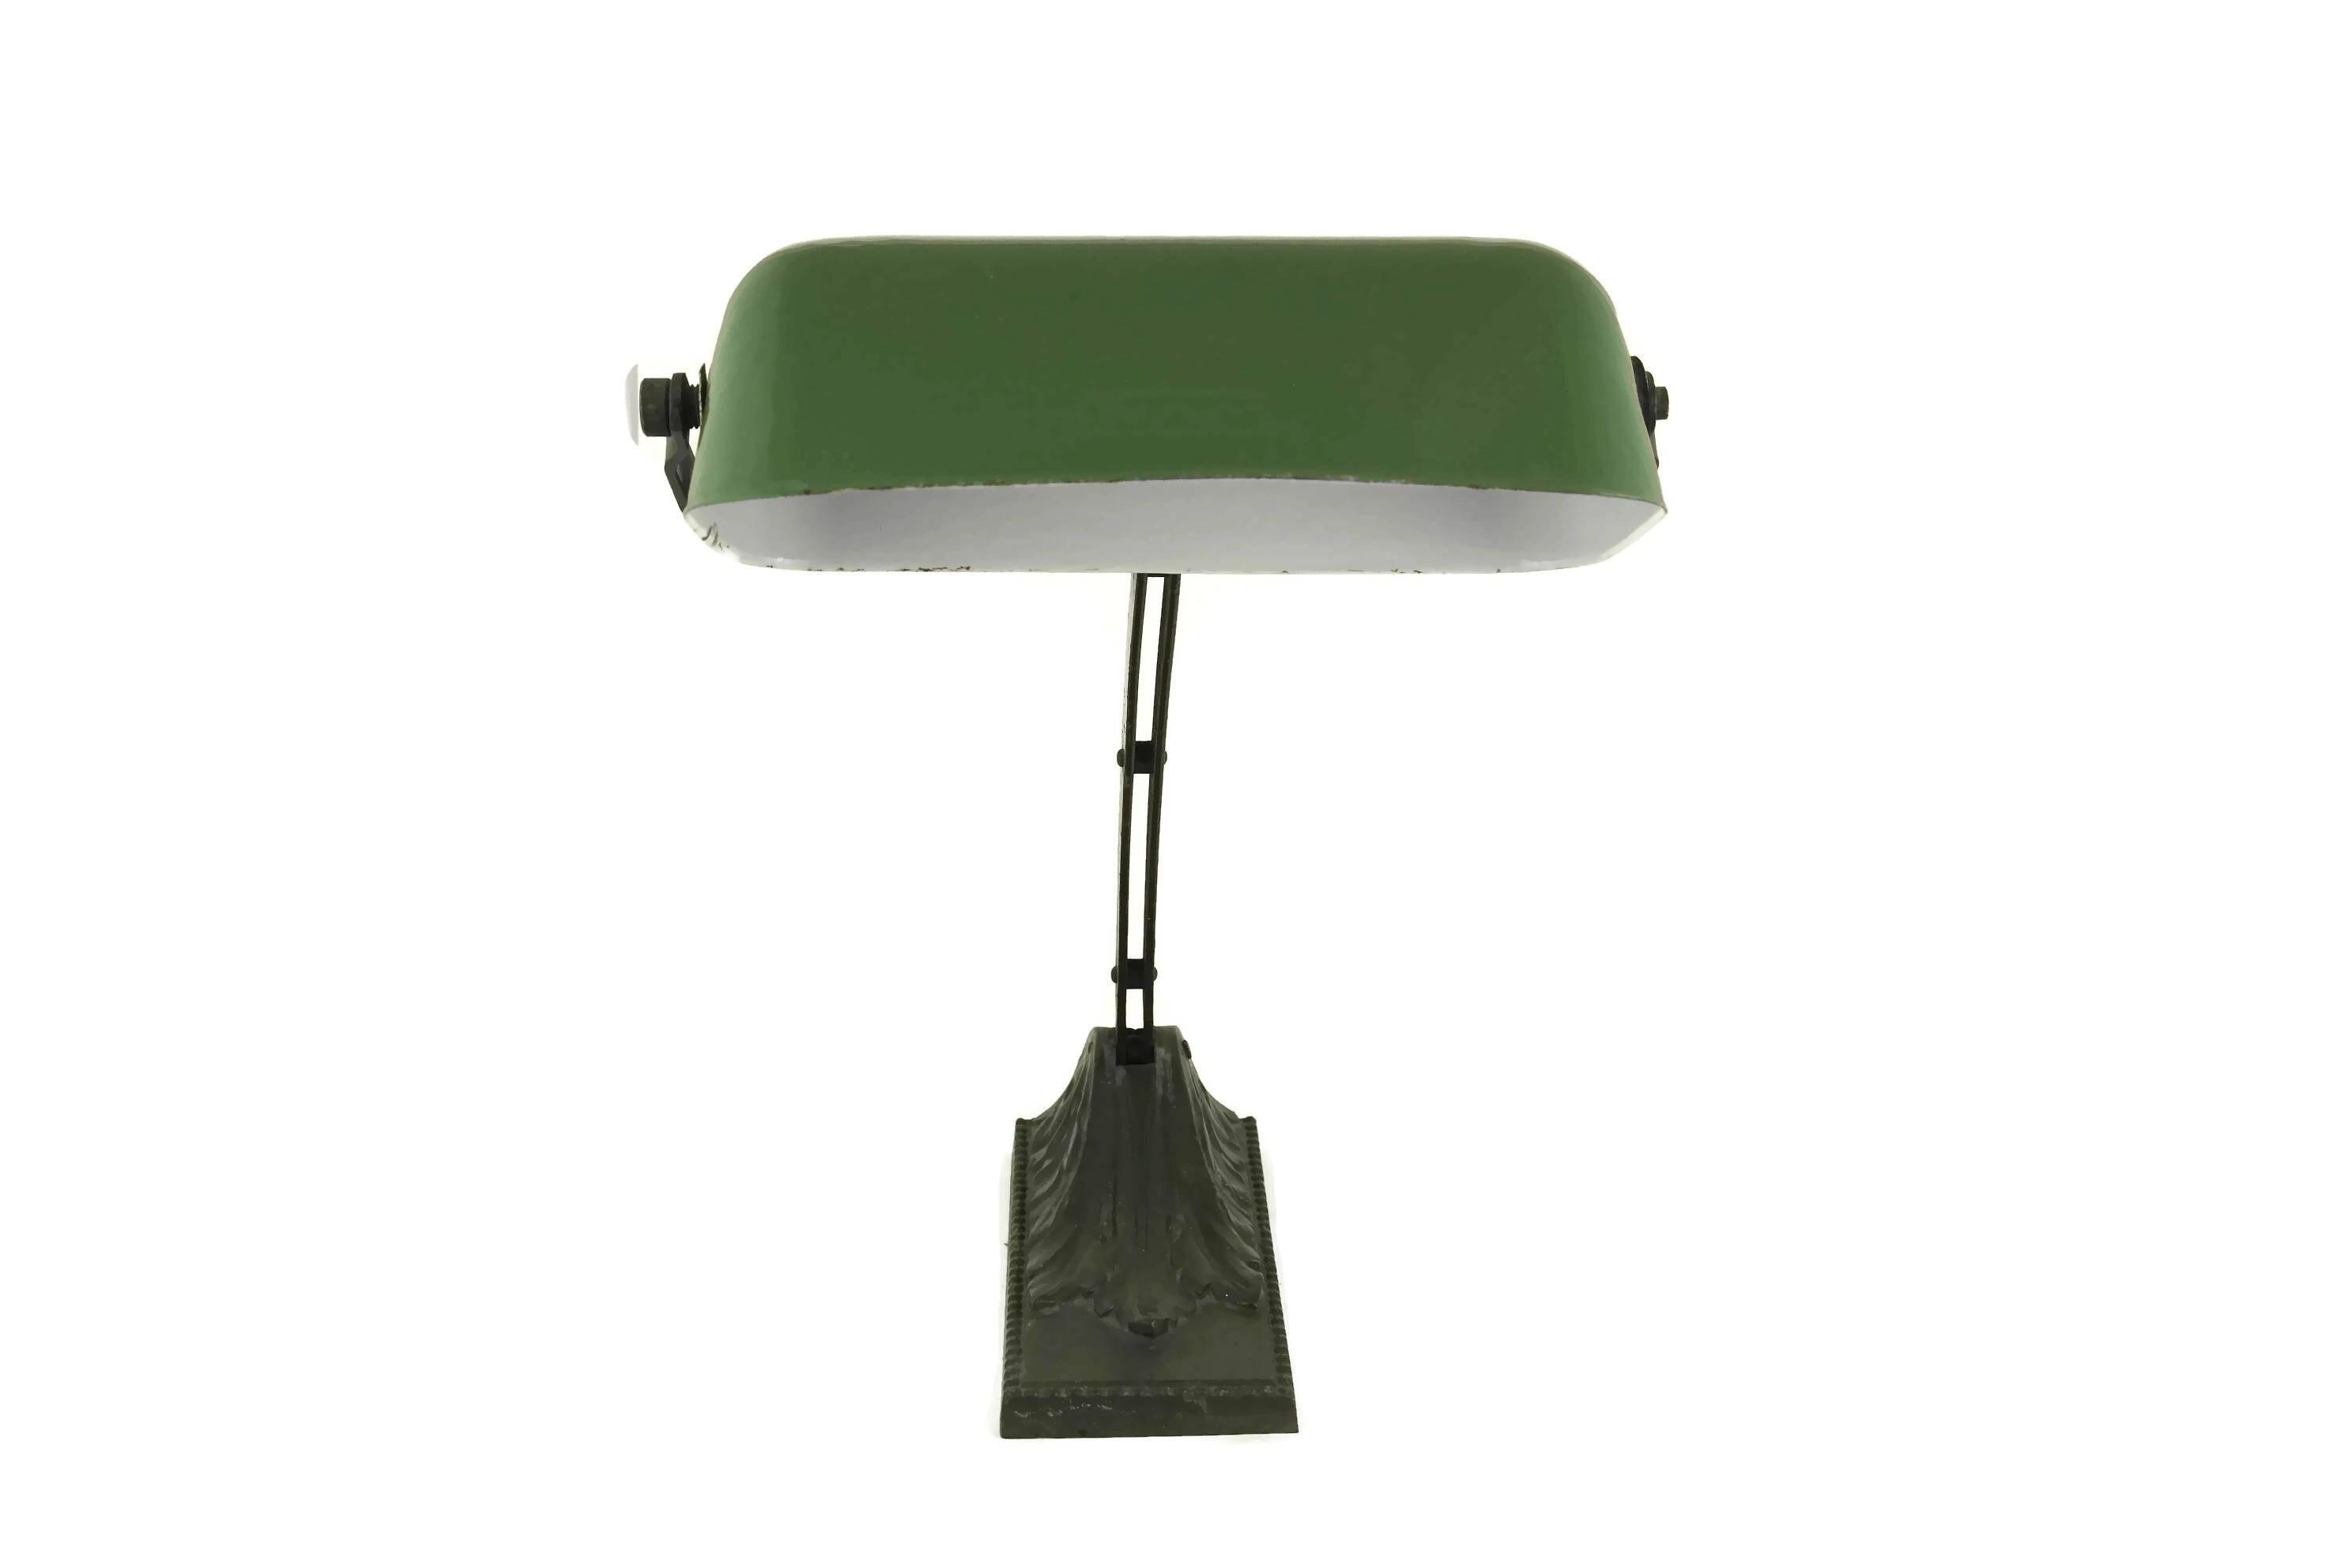 buloke decor lamp desk metal art black table adjustable marble american white products